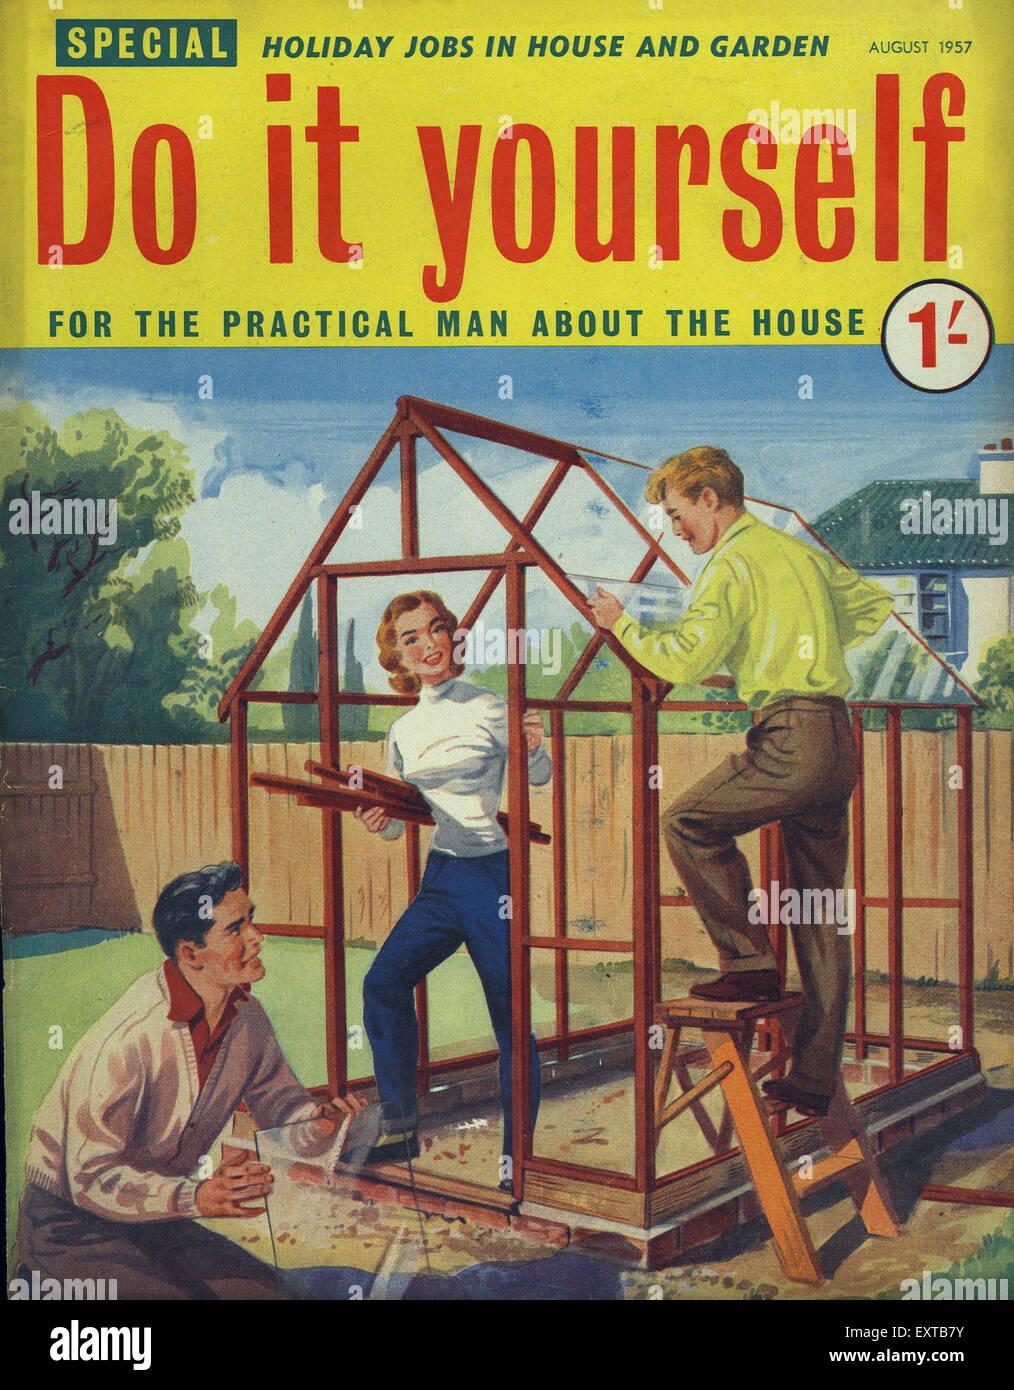 1950s uk do it yourself magazine cover stock photo 85358223 alamy 1950s uk do it yourself magazine cover solutioingenieria Choice Image